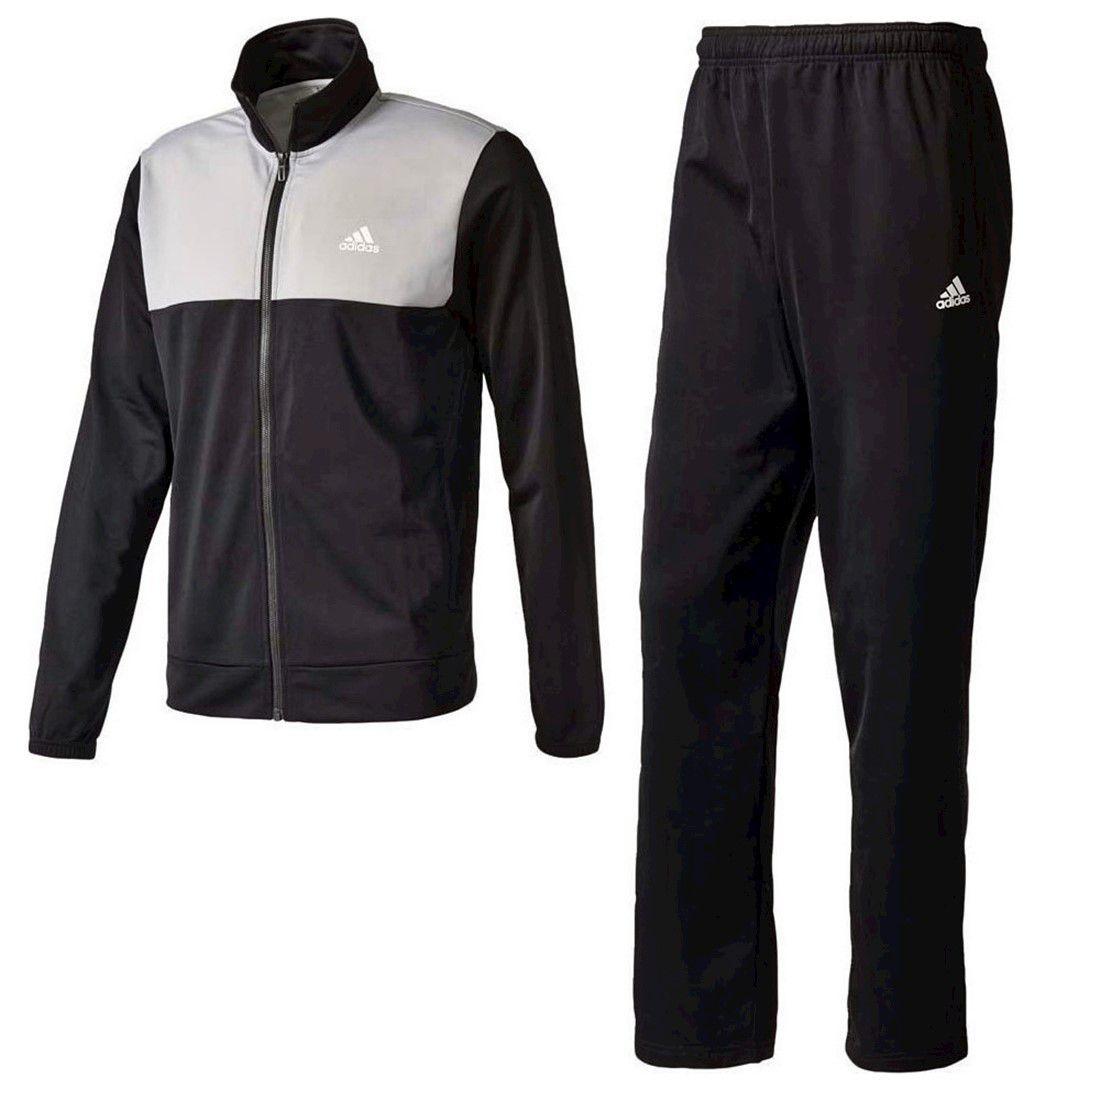 Agasalho Adidas Back2Basics Masculino - Preto e Cinza